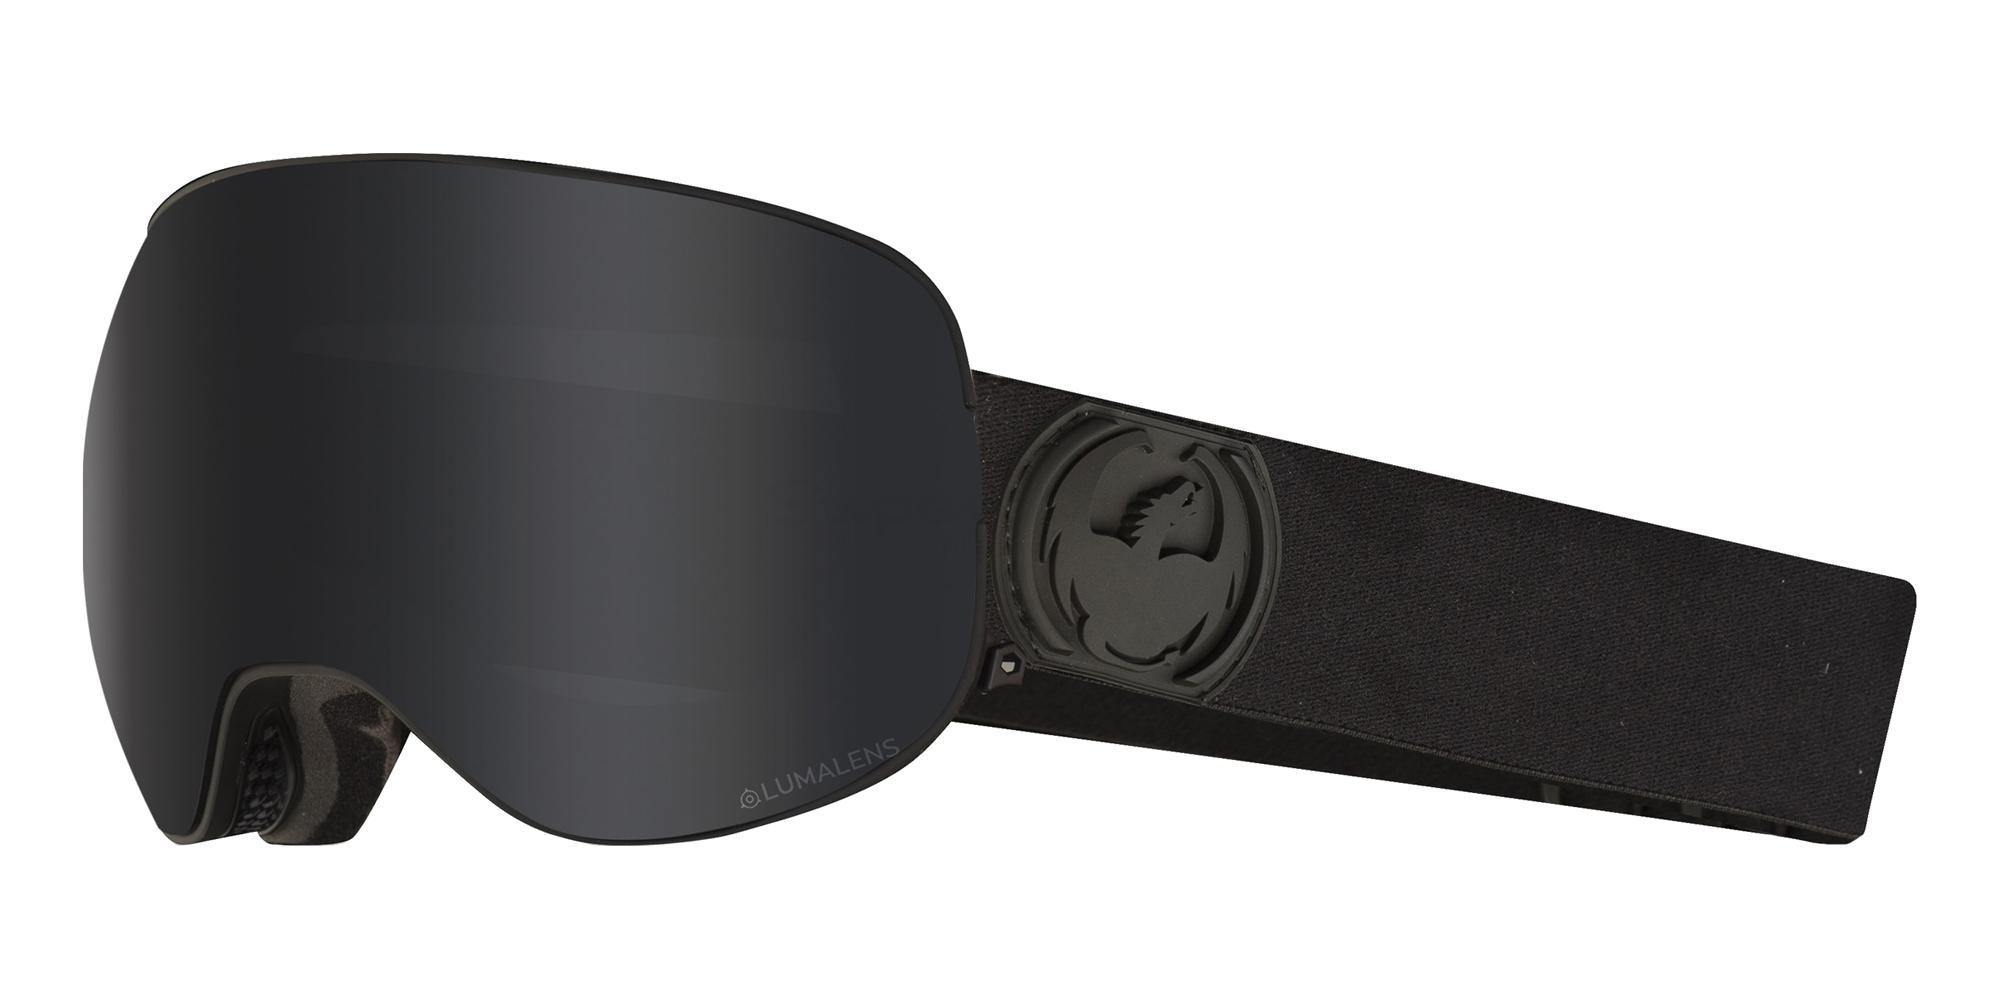 331 DR X2 THREE Goggles, Dragon